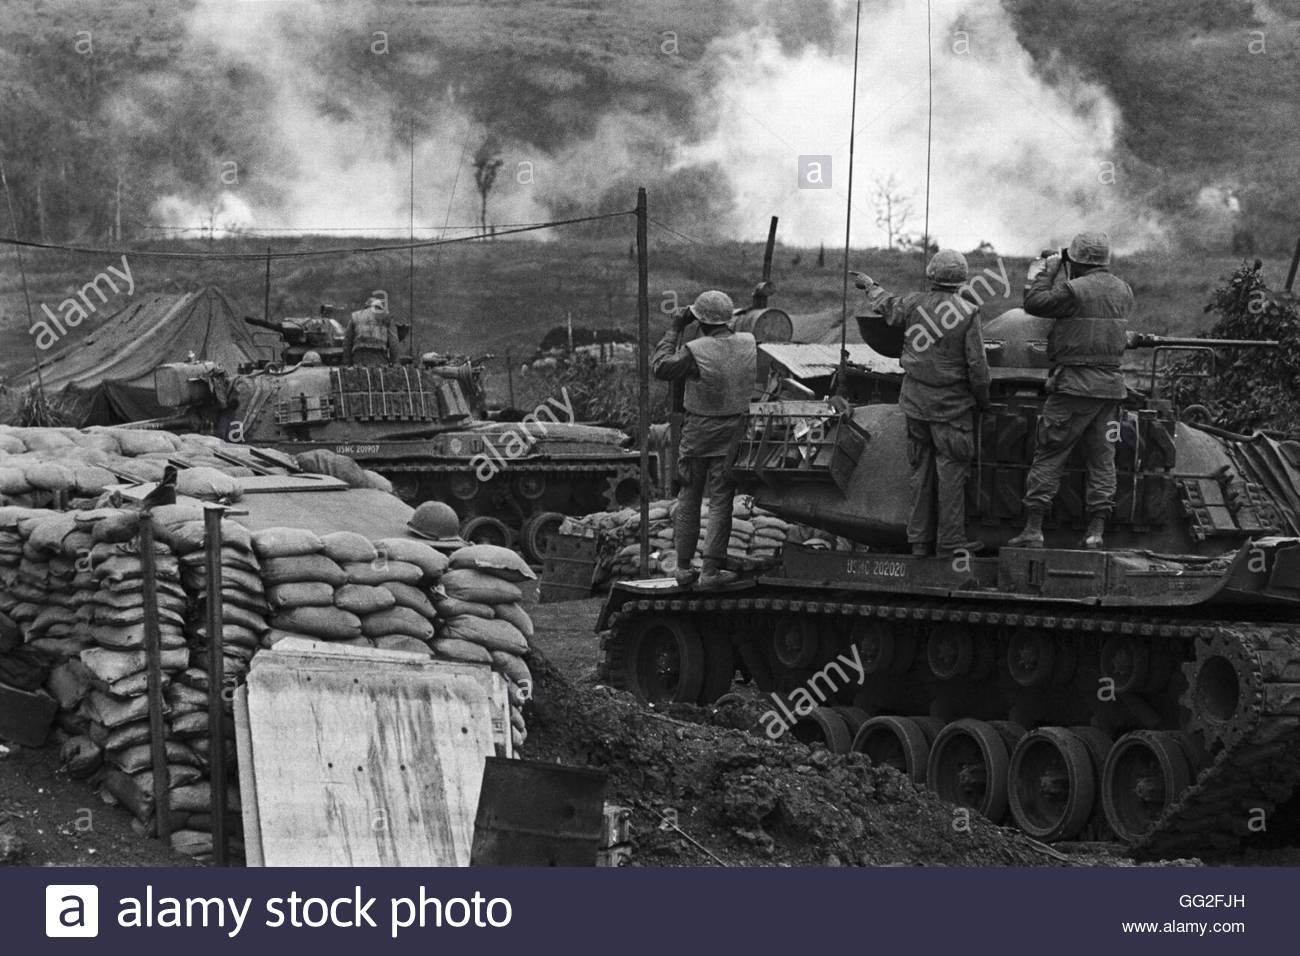 Vietnam War 1954-1975 Us-marines-tank-crews-watch-results-of-american-air-support-from-inside-GG2FJH